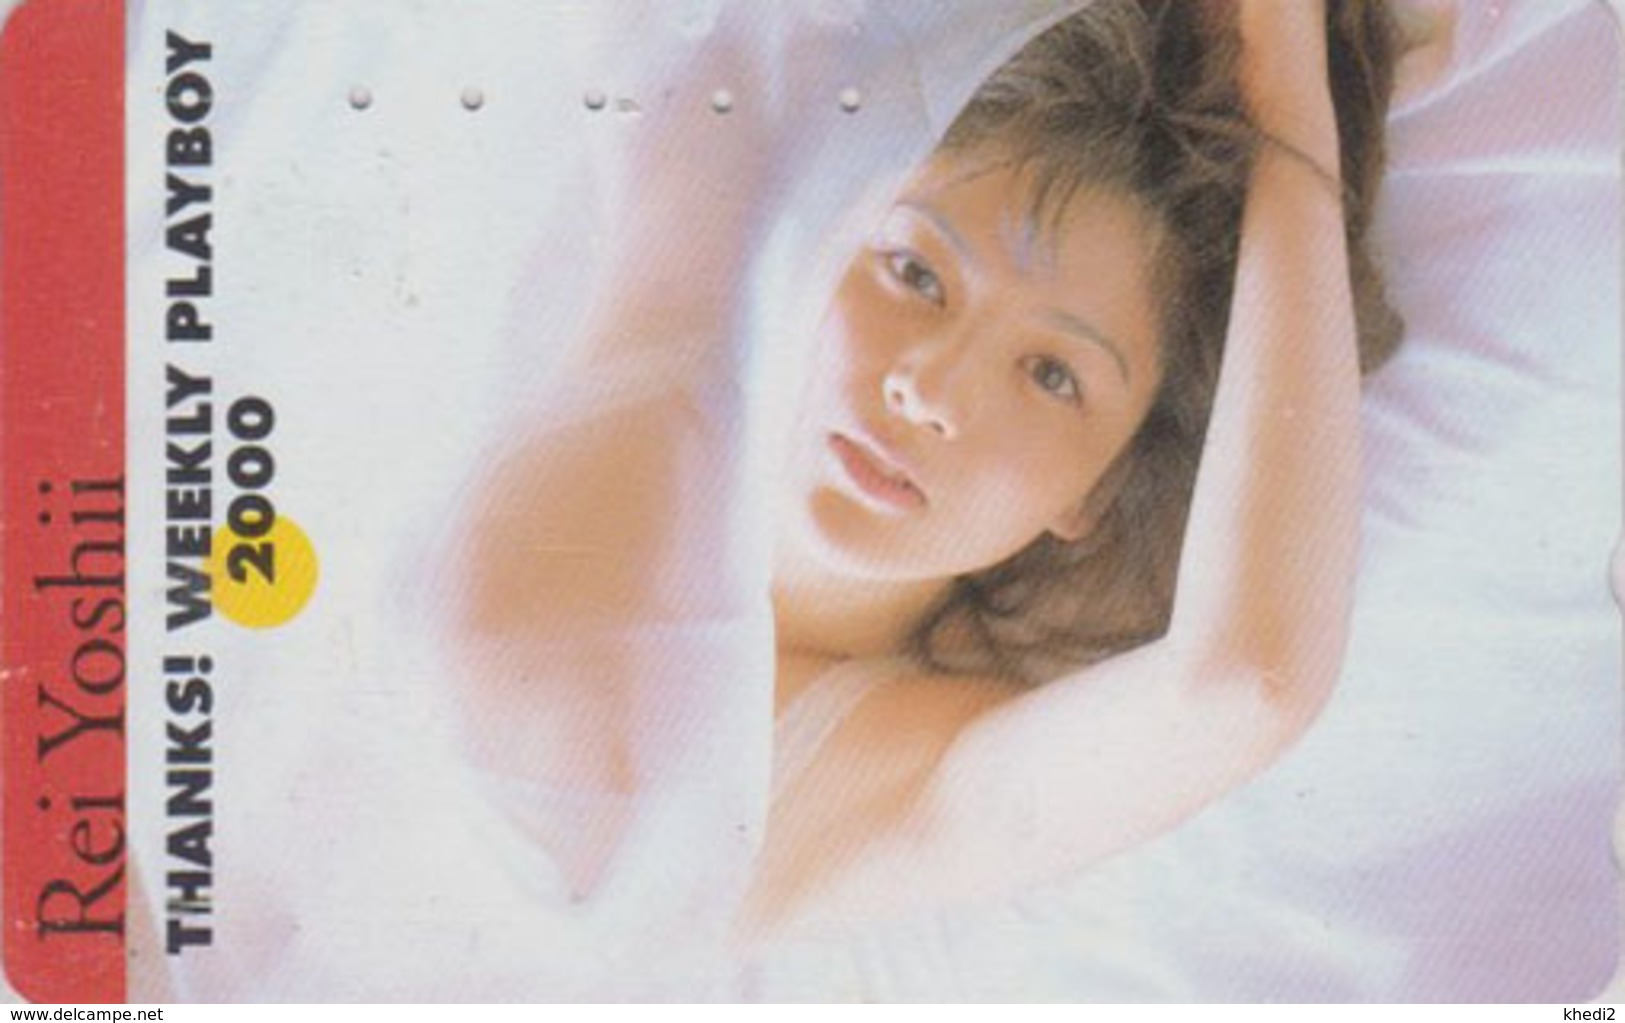 Télécarte Japon / 110-016 - PLAYBOY - FEMME - Cinema REI YOSHII - Girl Actress Movie Star Japan Phonecard - 6331 - Characters